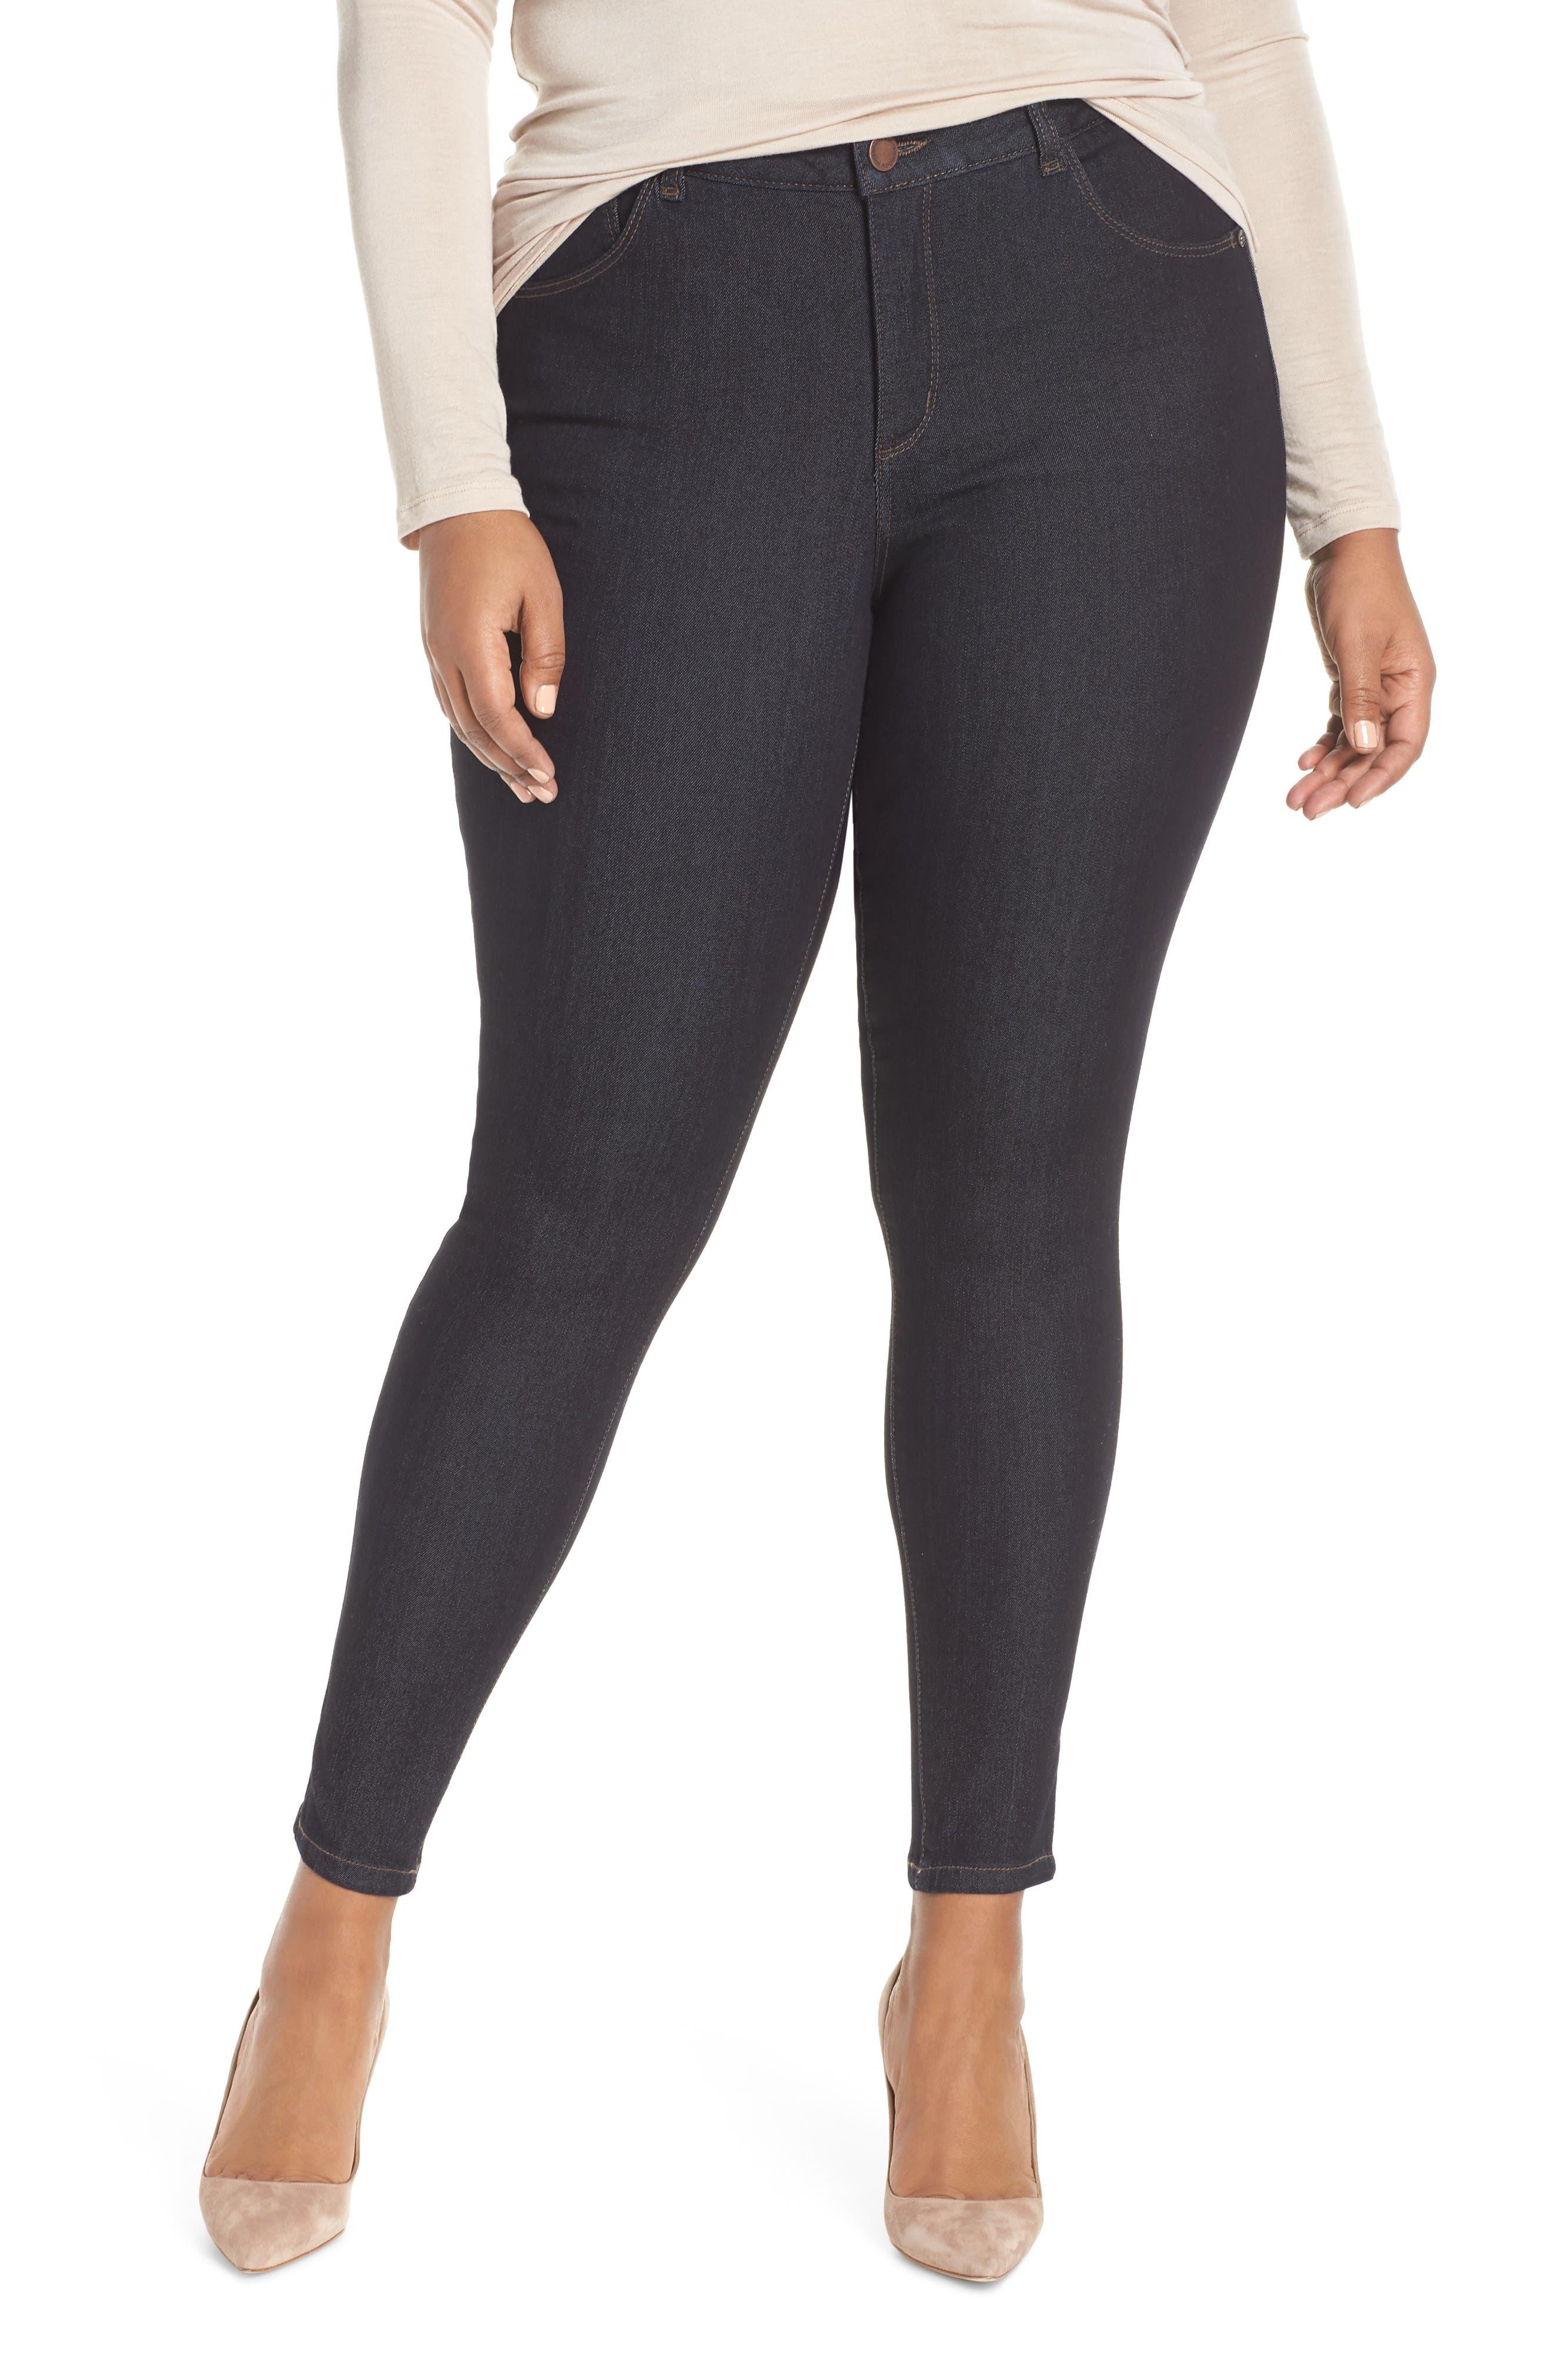 30/11 Ab-solution High Waist Skinny Jeans,                             Main thumbnail 1, color,                             INDIGO